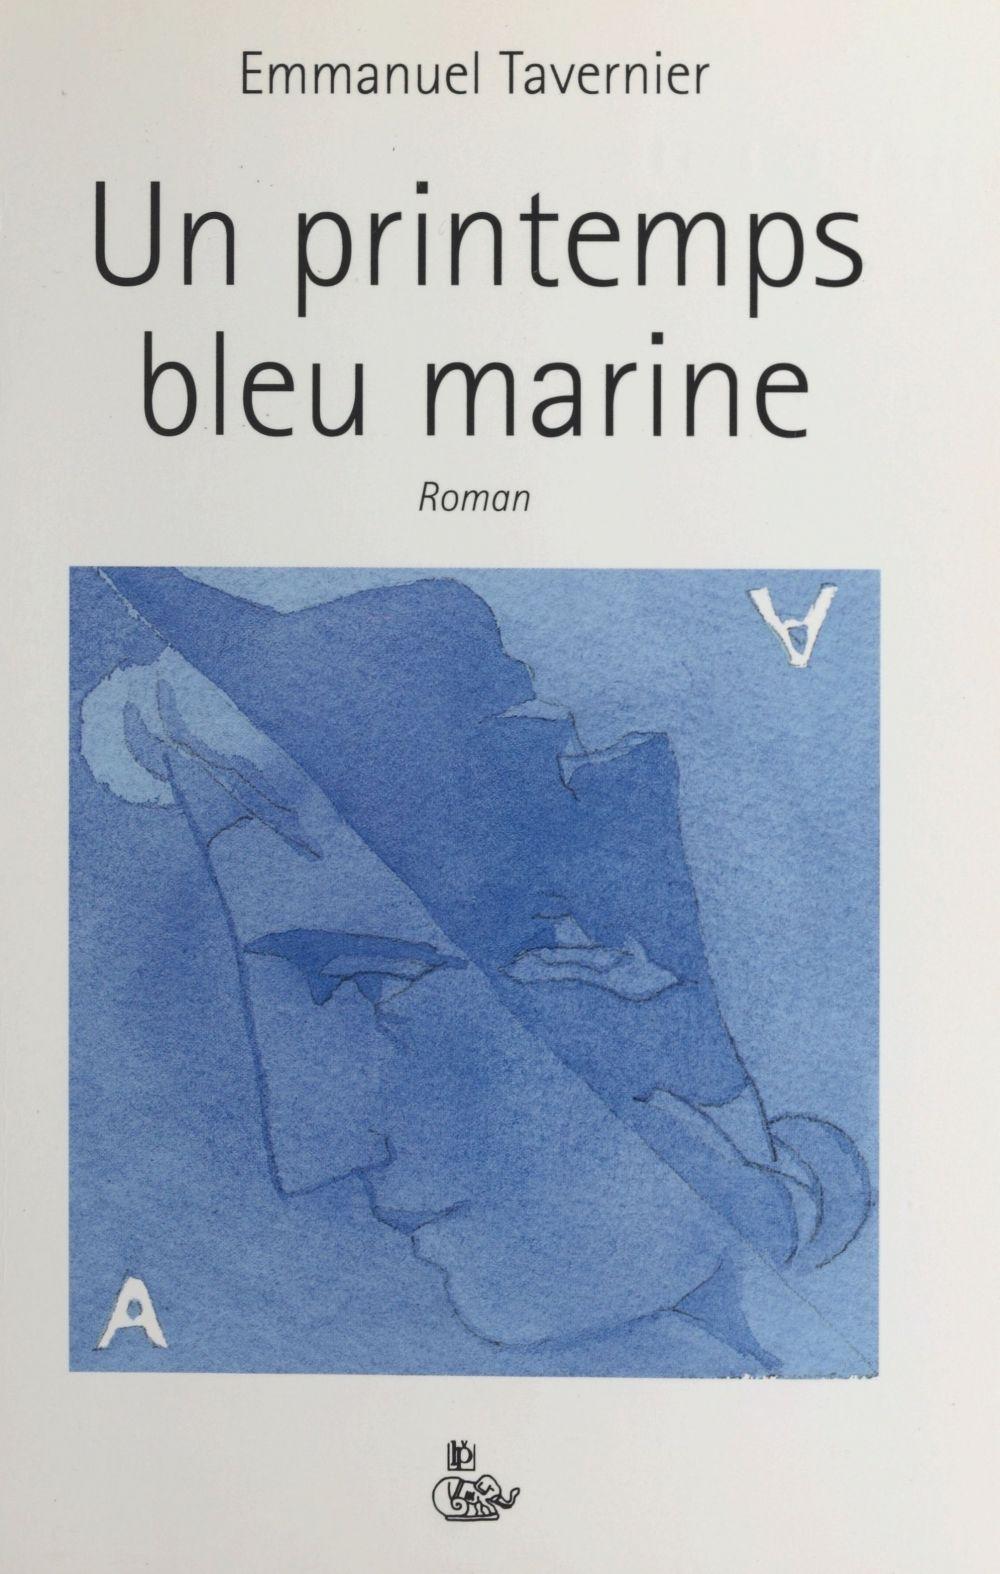 Un printemps bleu marine